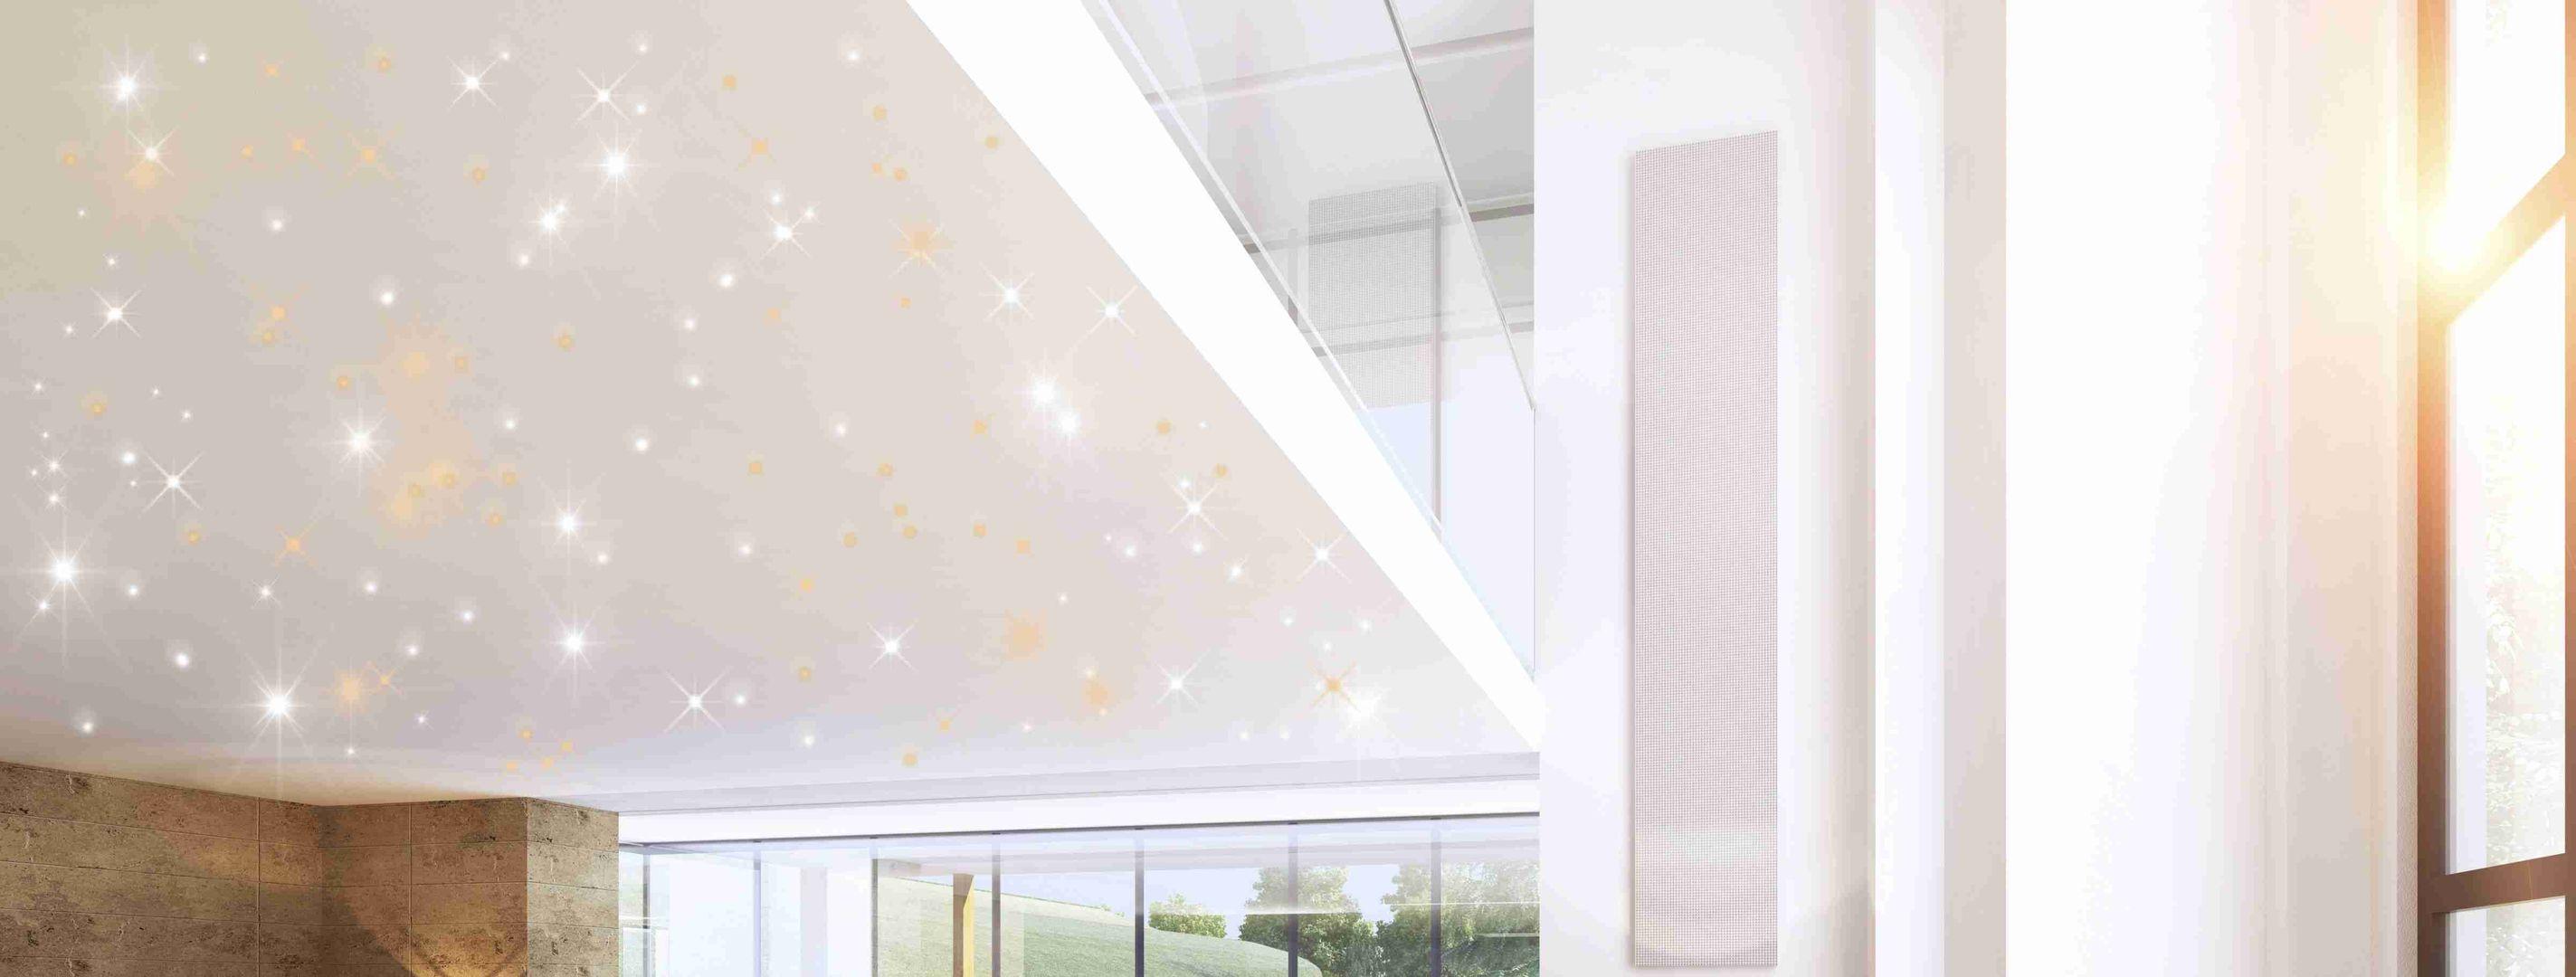 PIXLUM LED Sternenhimmel Dokumente und Zertifikate